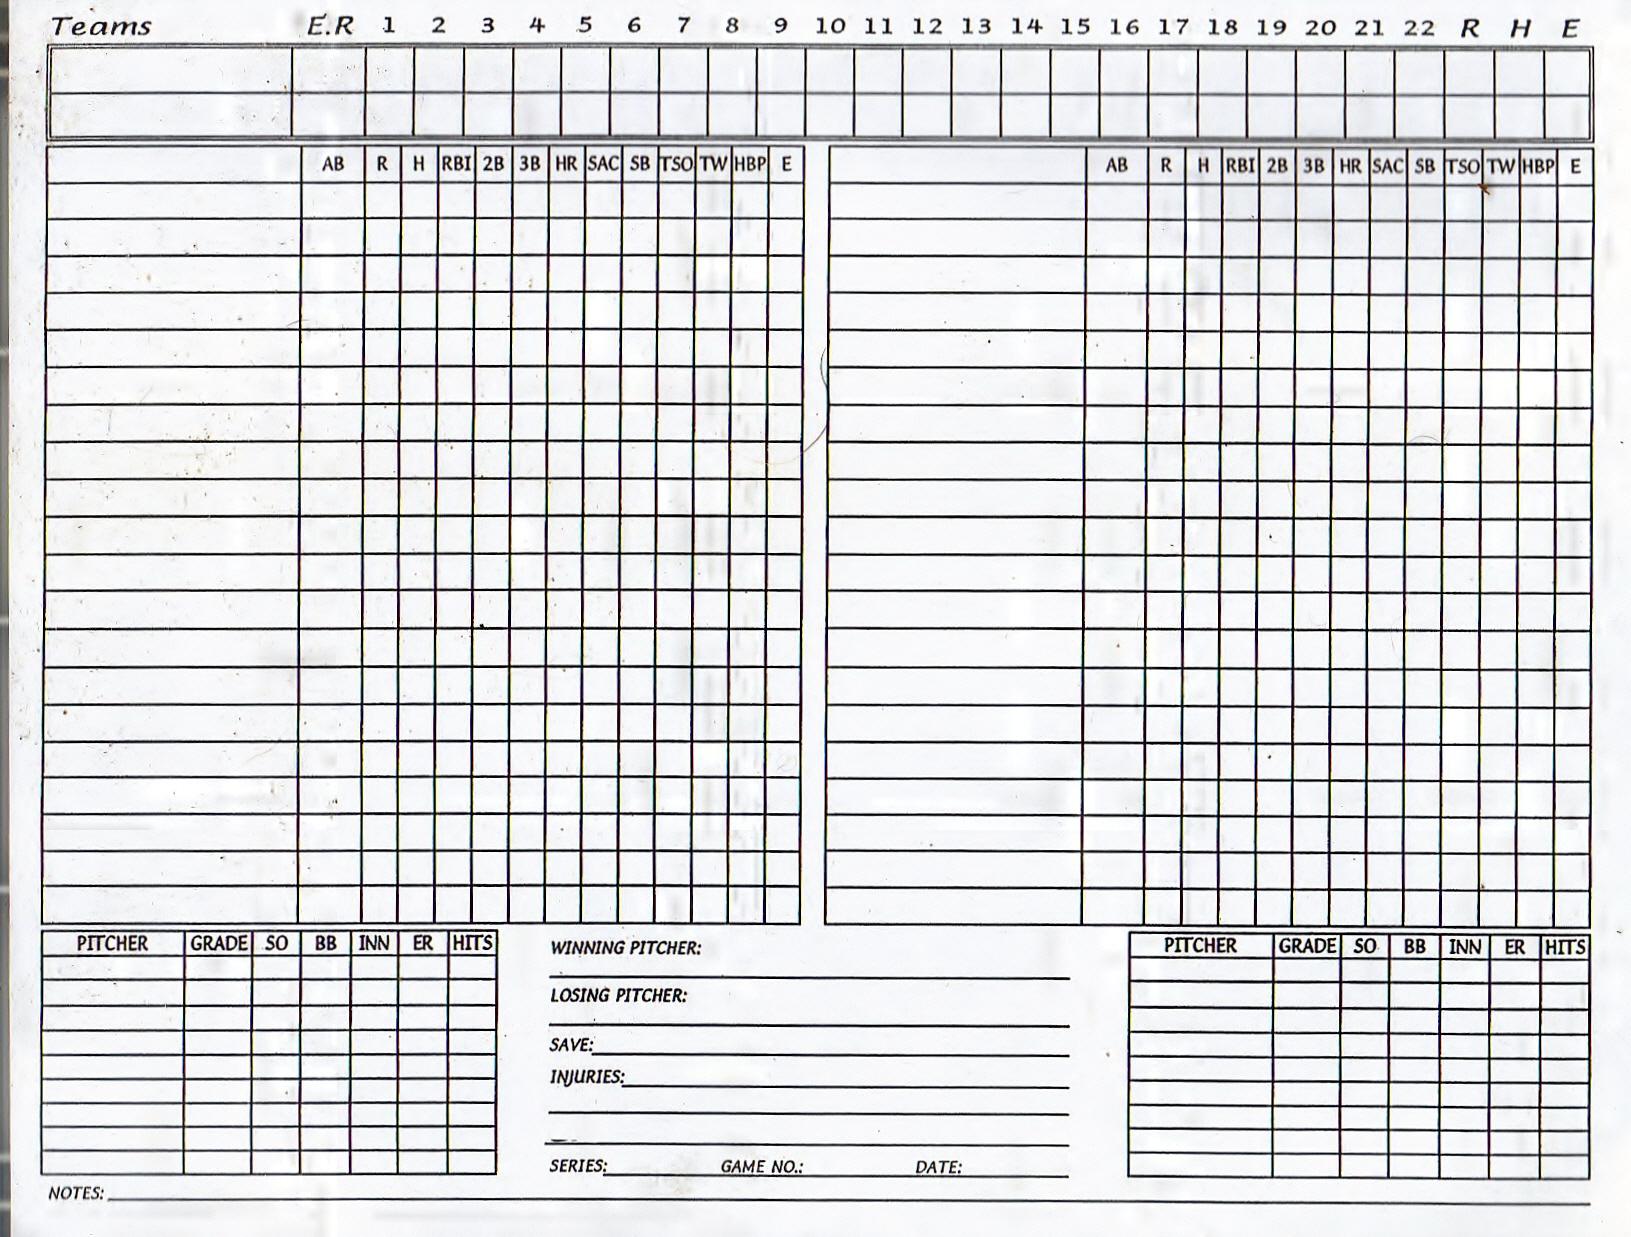 graphic about Printable Baseball Score Sheet named Blank Baseball Rating Sheet Pdf - Resume Illustrations Resume